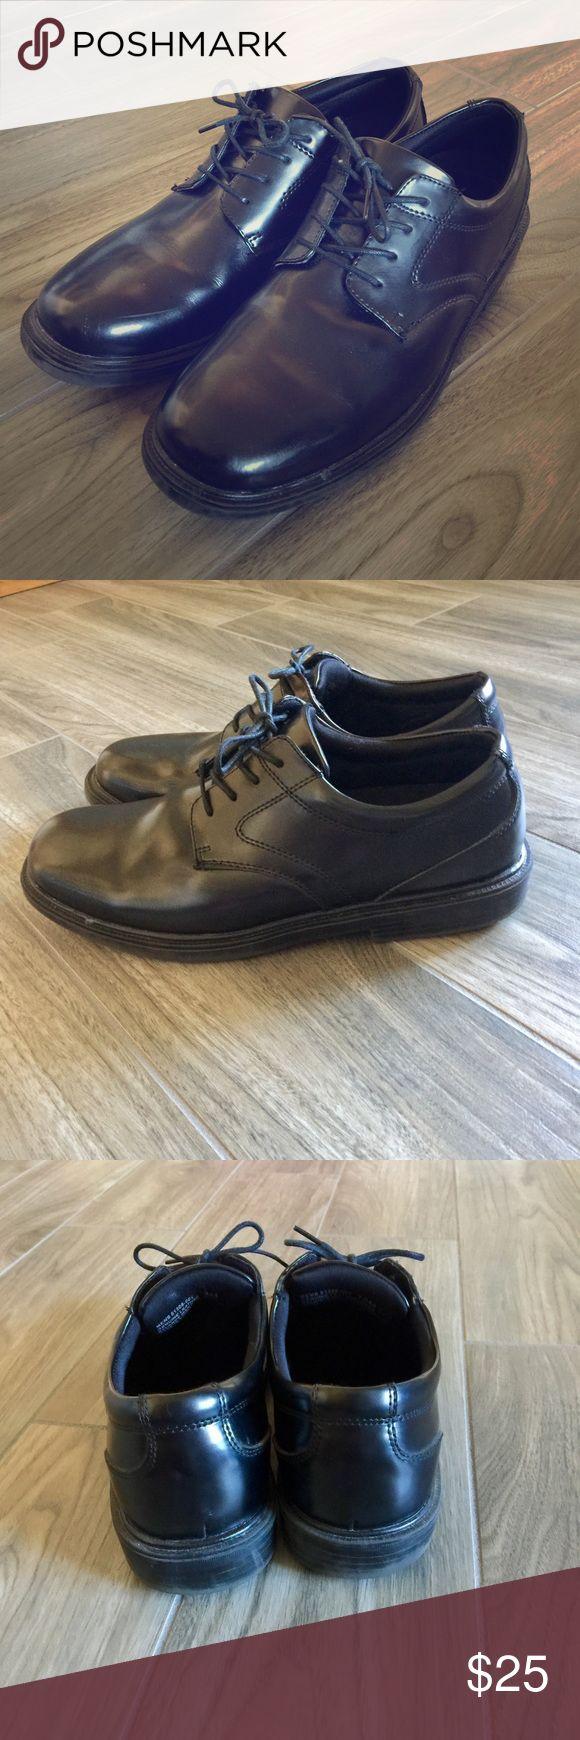 Nunn Bush Dynamic Comfort Mens Dress Shoes Nunn Bush Dynamic Comfort Mens Dress Shoes in Black Leather. Slip Resistant. Small Scuff On Toe Of Shoe As Pictured. Size 12. Nunn Bush Shoes